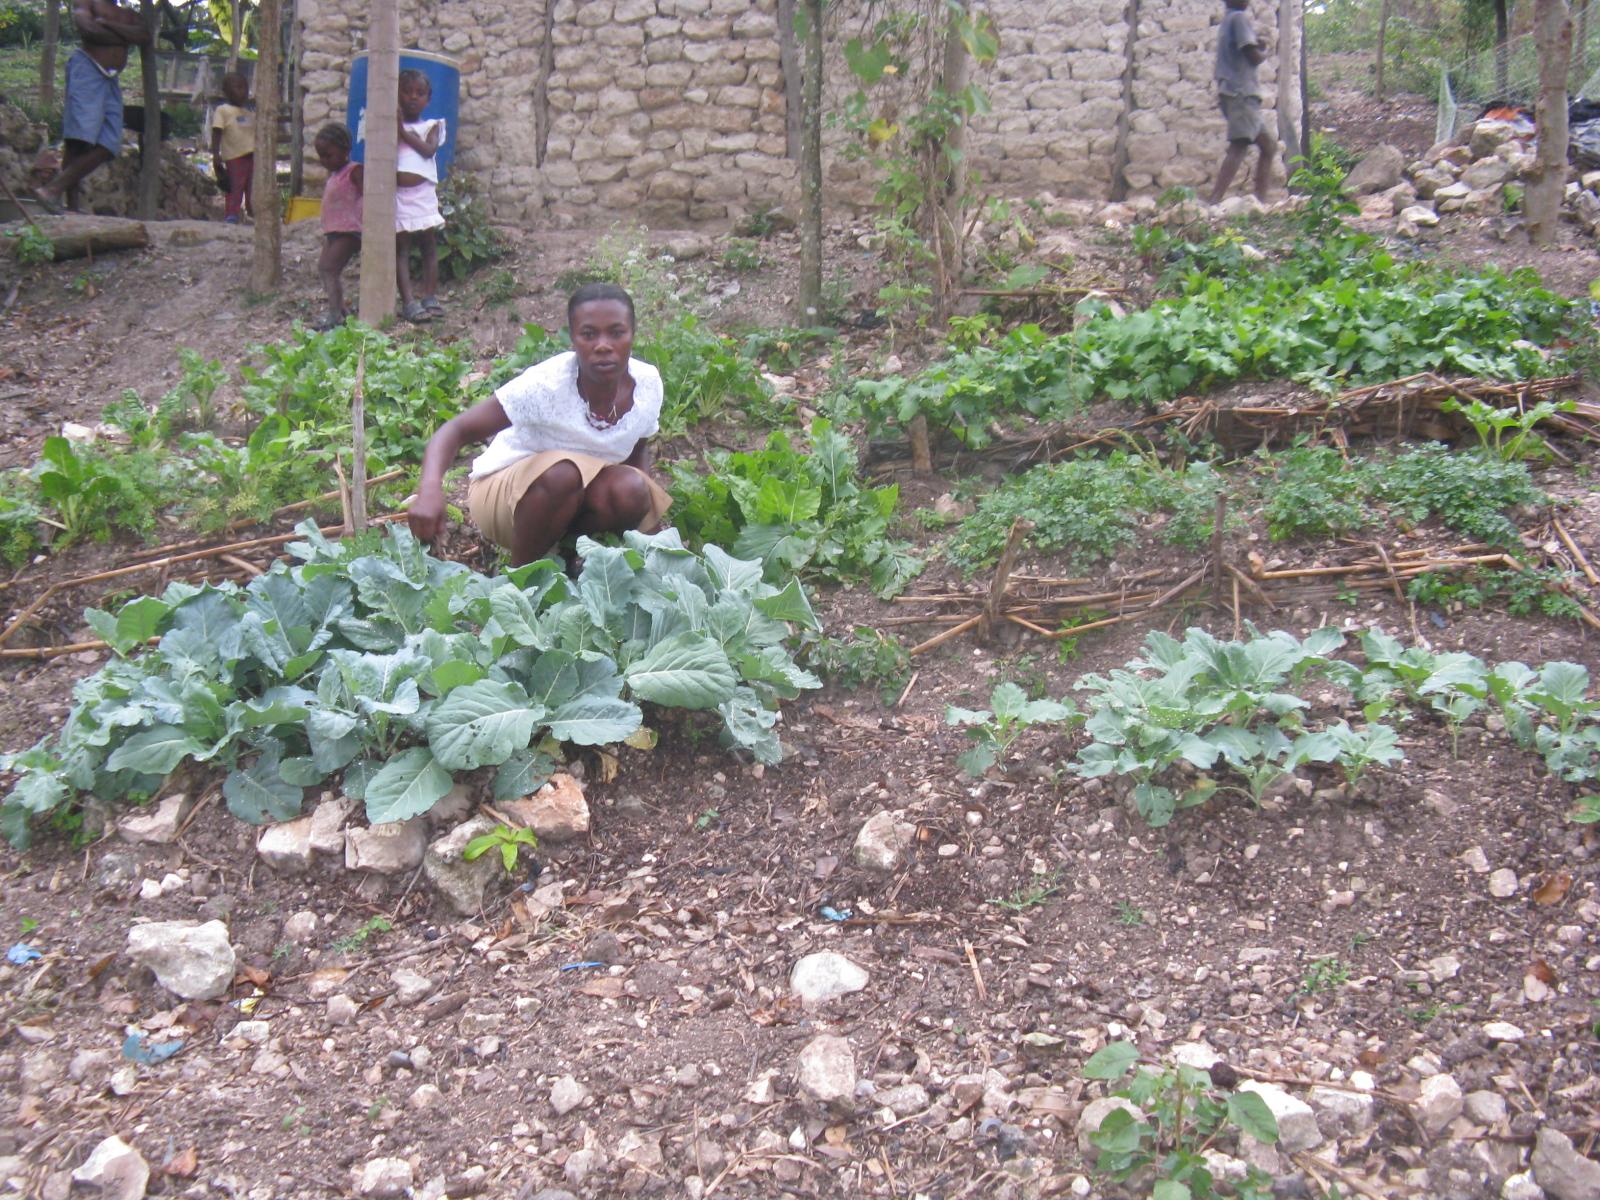 haiti2009odanies_square_garden1_at_grand_boulage__gbg_002.jpg